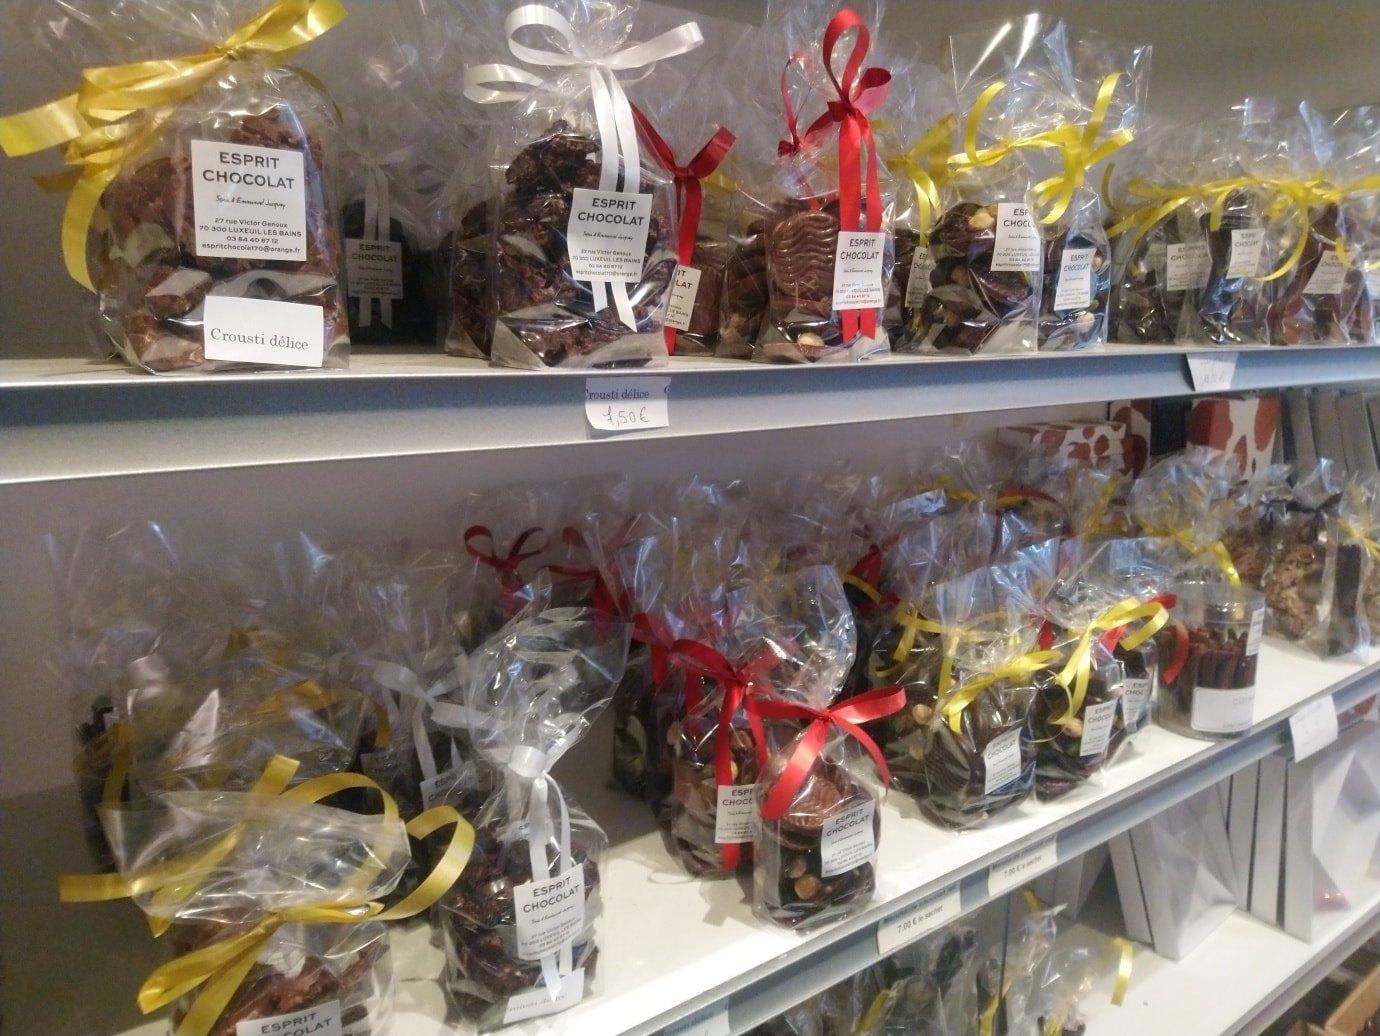 esprit chocolat luxeuil (3)